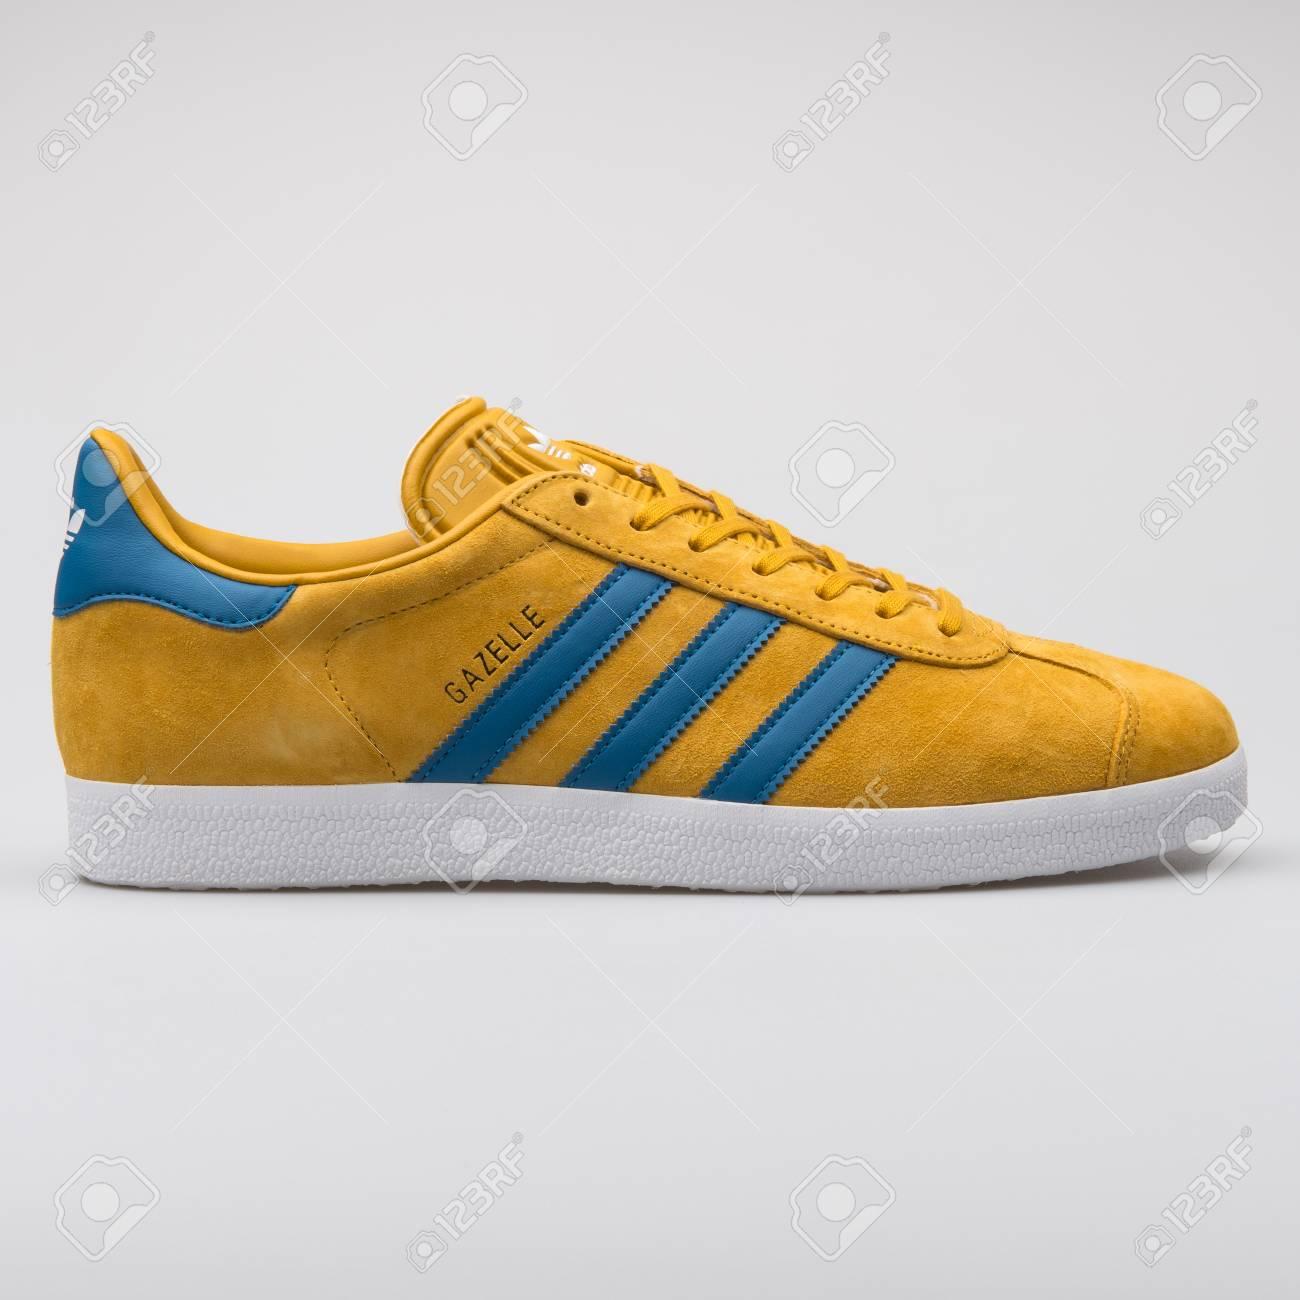 Adidas Gazelle Yellow And Blue.. Stock